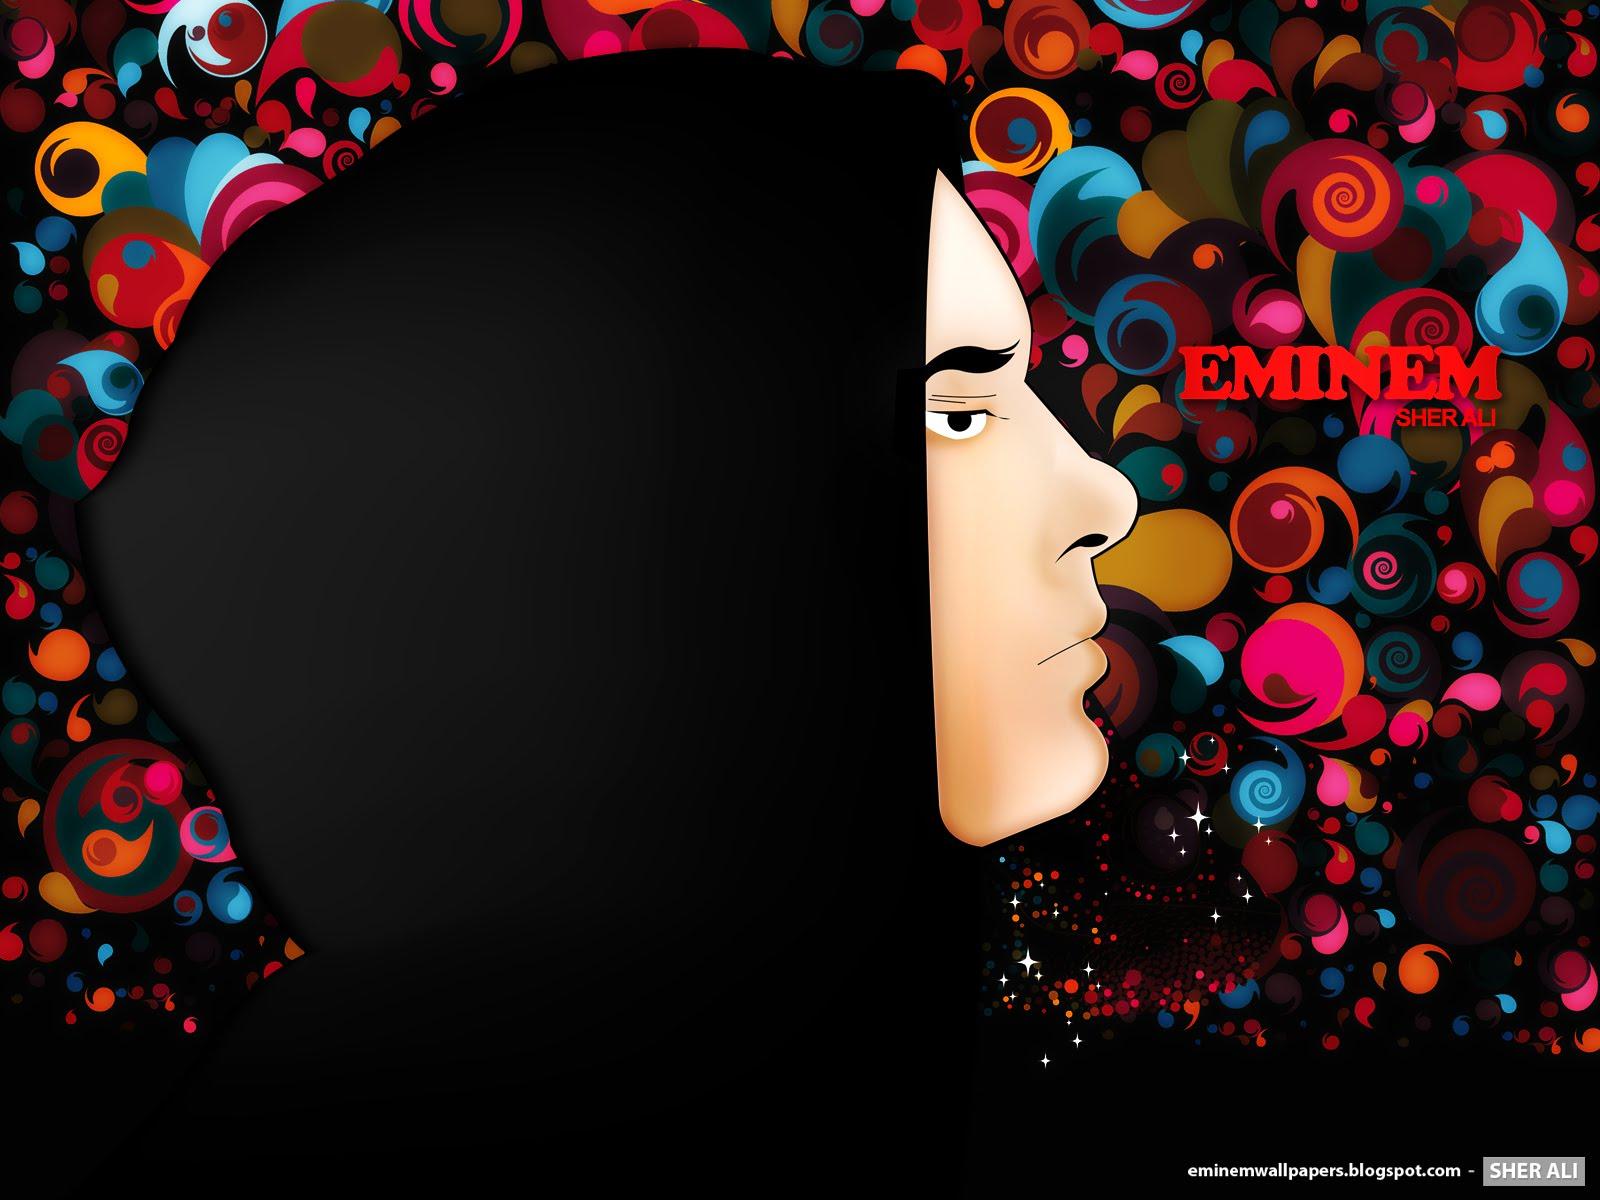 http://4.bp.blogspot.com/_STy5nejOM6k/S-ssxAeulZI/AAAAAAAAFLk/5-lcogrLscc/s1600/eminem+illustration+wallpapers+-+eminemwallpapers-dot-blogspot-dot-com.jpg